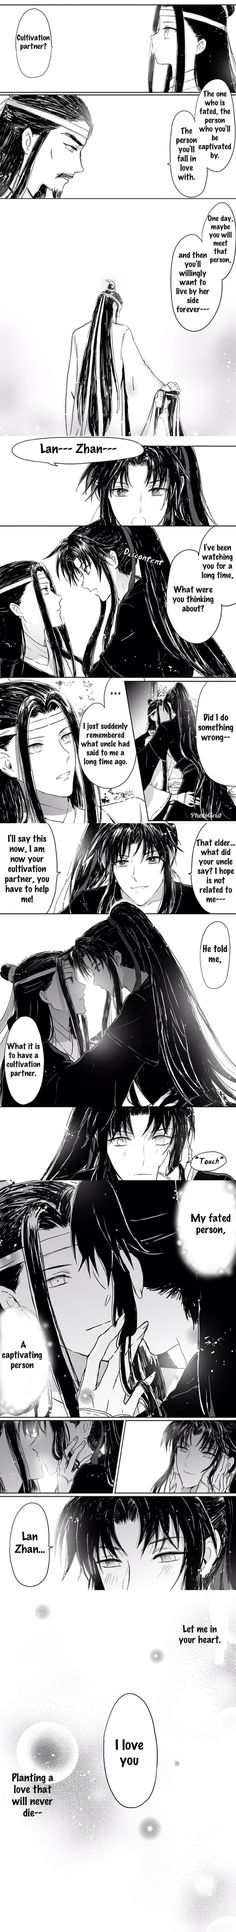 Me Me Me Anime, Anime Love, Anime Guys, Manga, Anime Fight, Great Novels, The Grandmaster, Shounen Ai, Anime Ships